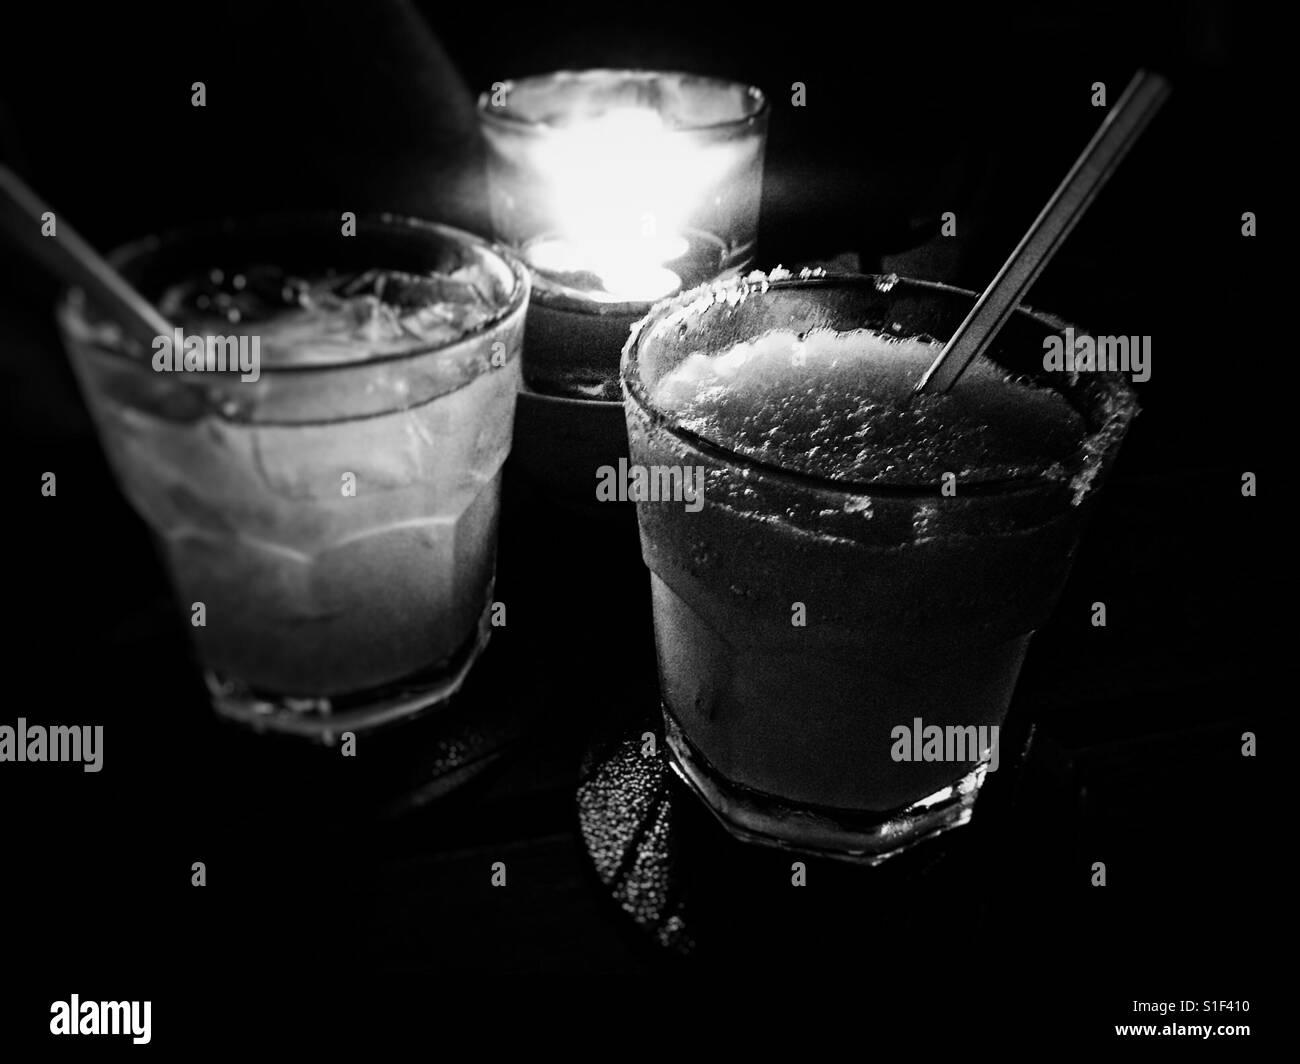 Margaritas and candlelight in Kota Kinabalu - Stock Image